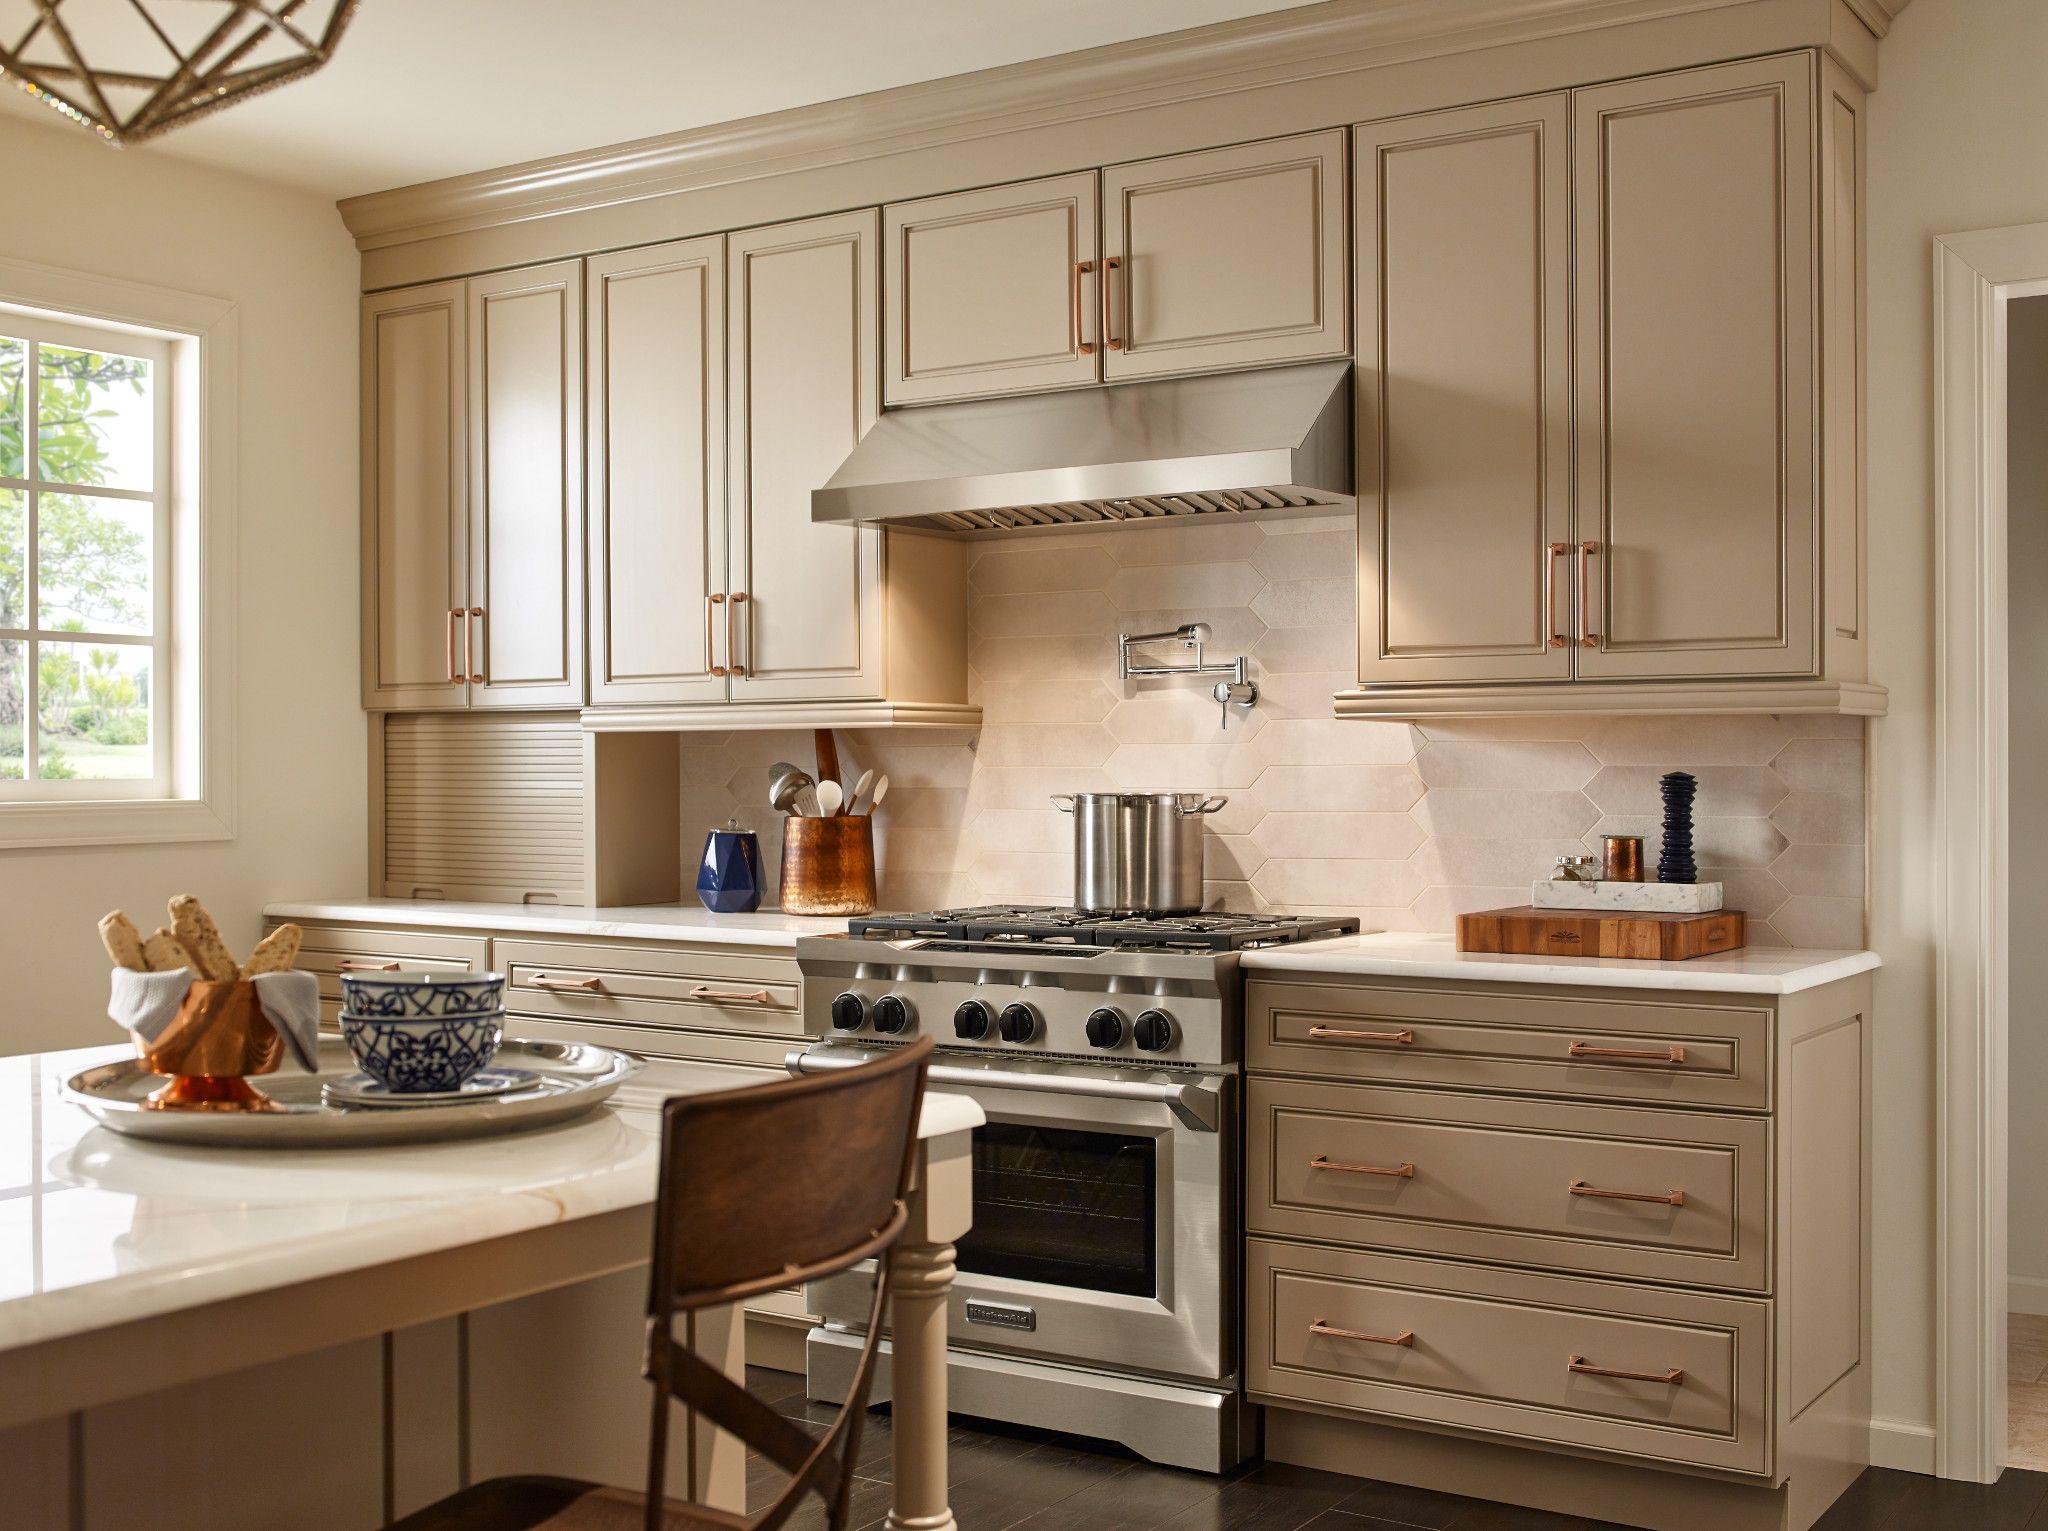 Bathe your cook top in the warm glow of 3 halogen bulbs This range